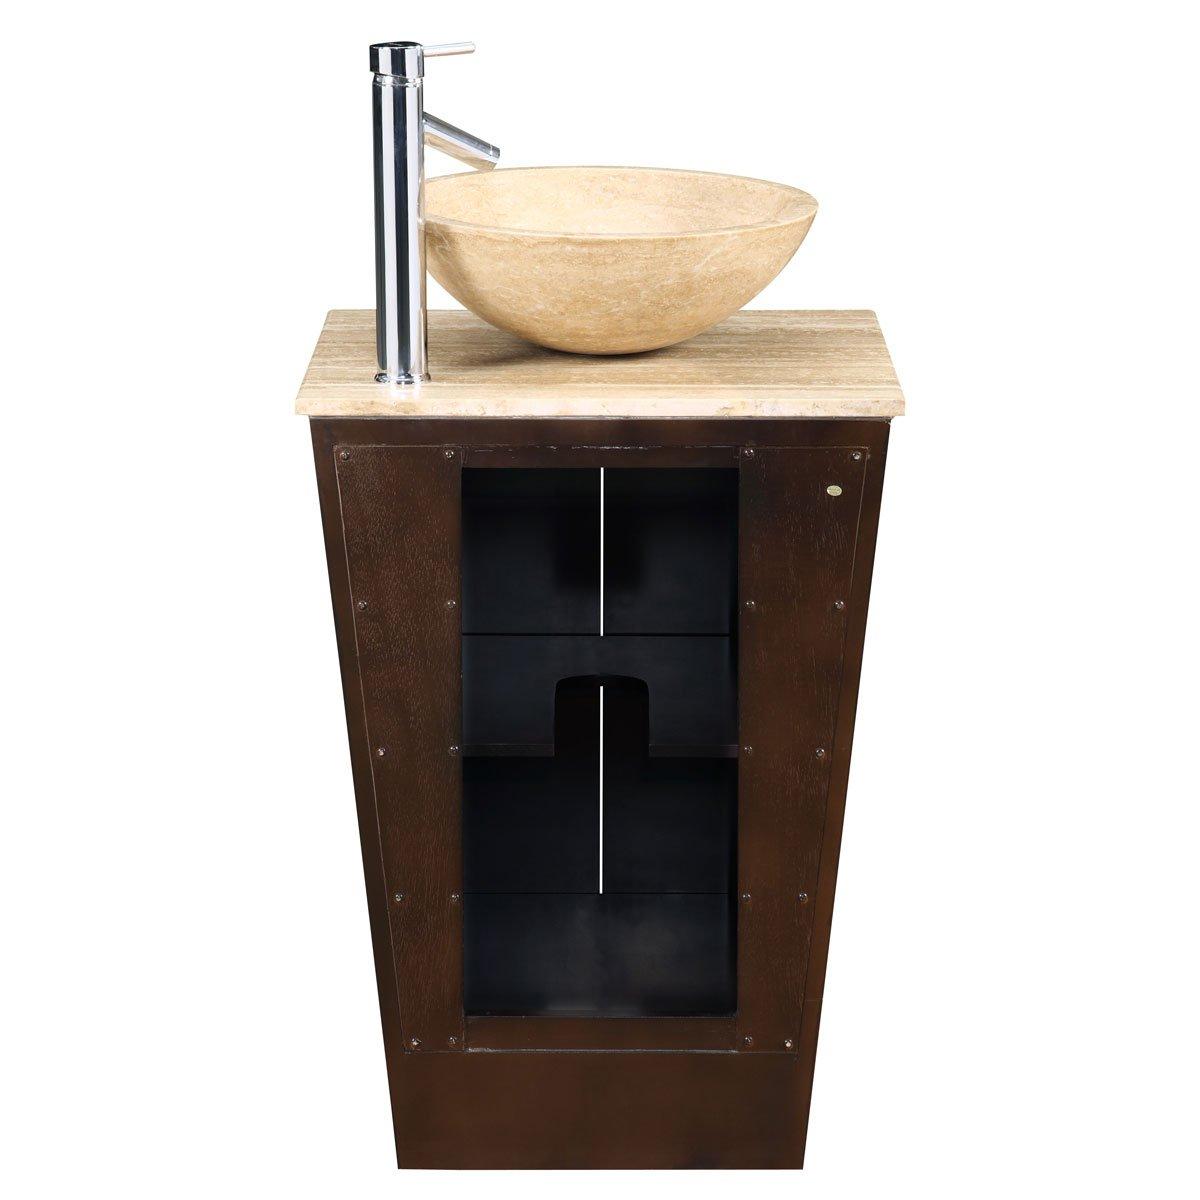 amazoncom silkroad exclusive travertine stone single sink vessel bathroom vanity with storage cabinet 22inch home u0026 kitchen